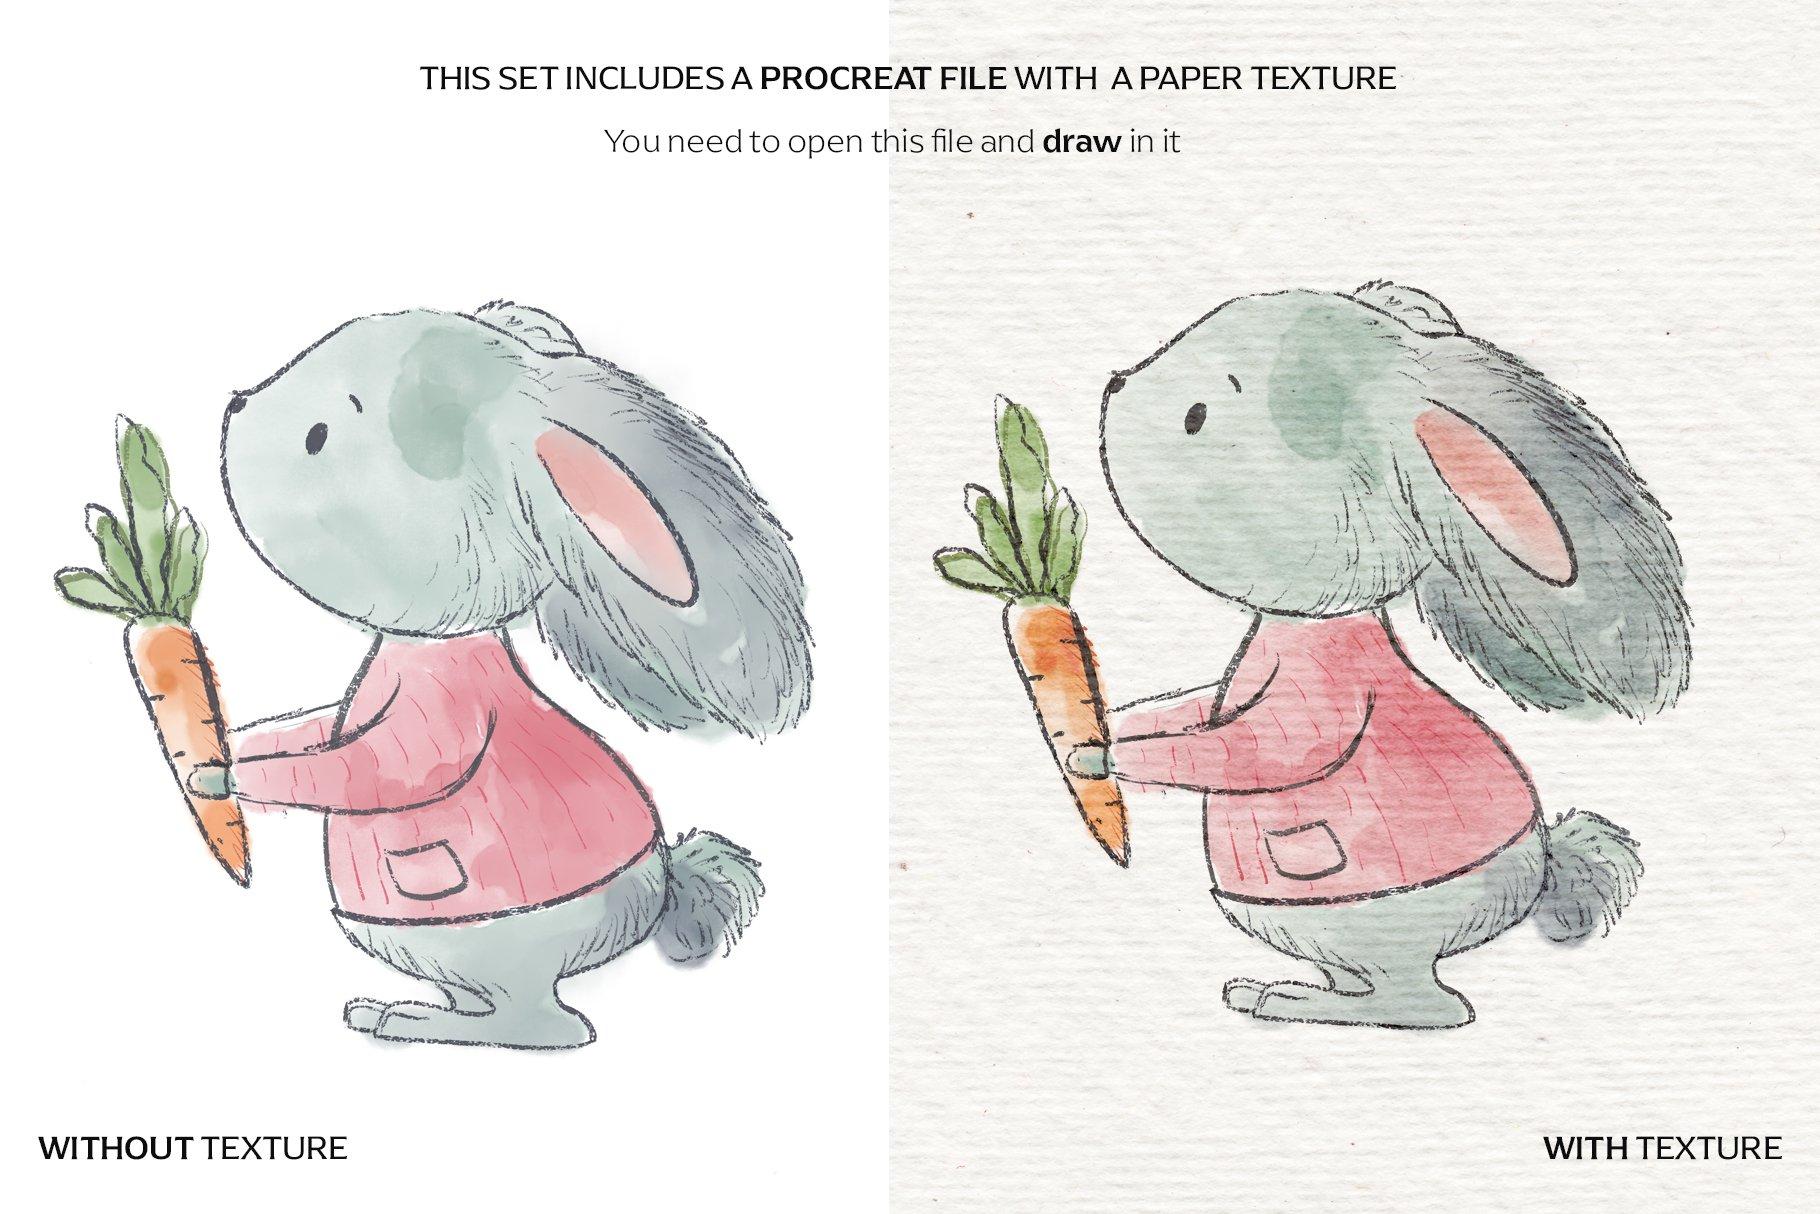 14款水彩铅笔Procreate笔刷包 Watercolor & Pencil Procreate brushes插图(5)